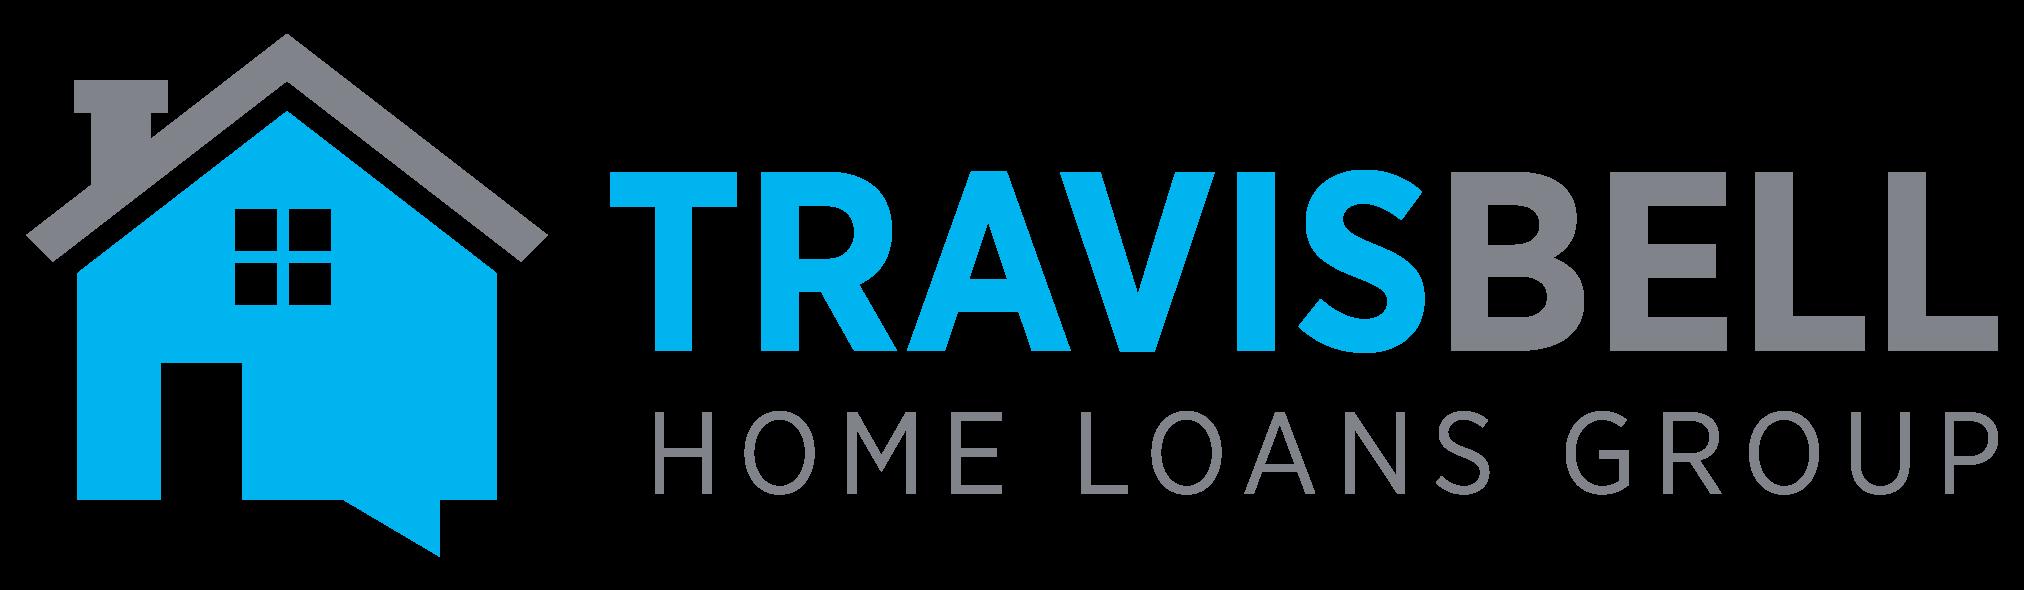 Travis Bell Home Loans